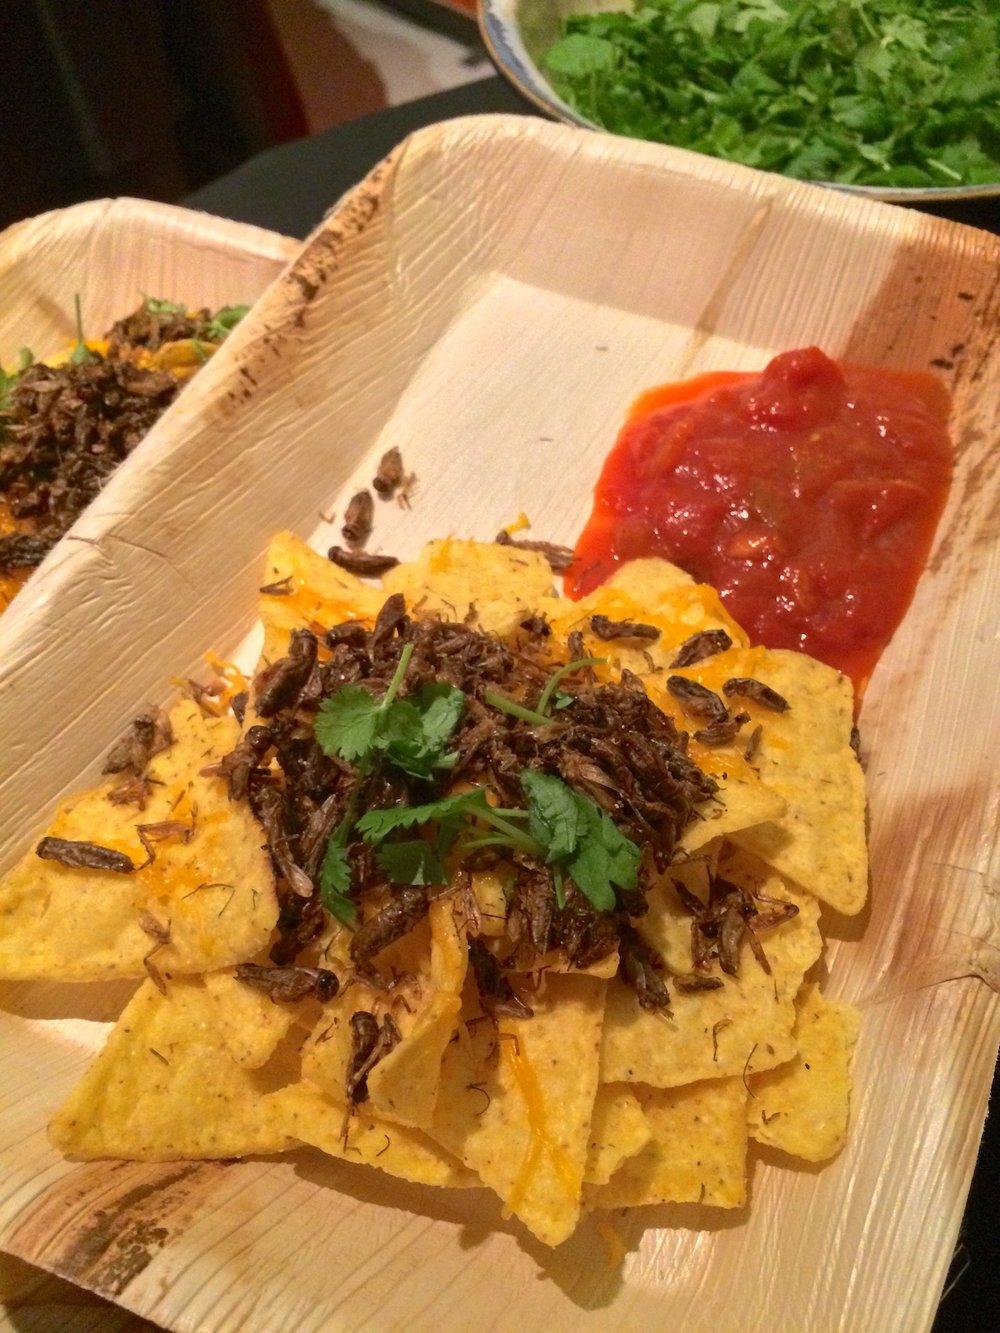 Cricket nacho platter